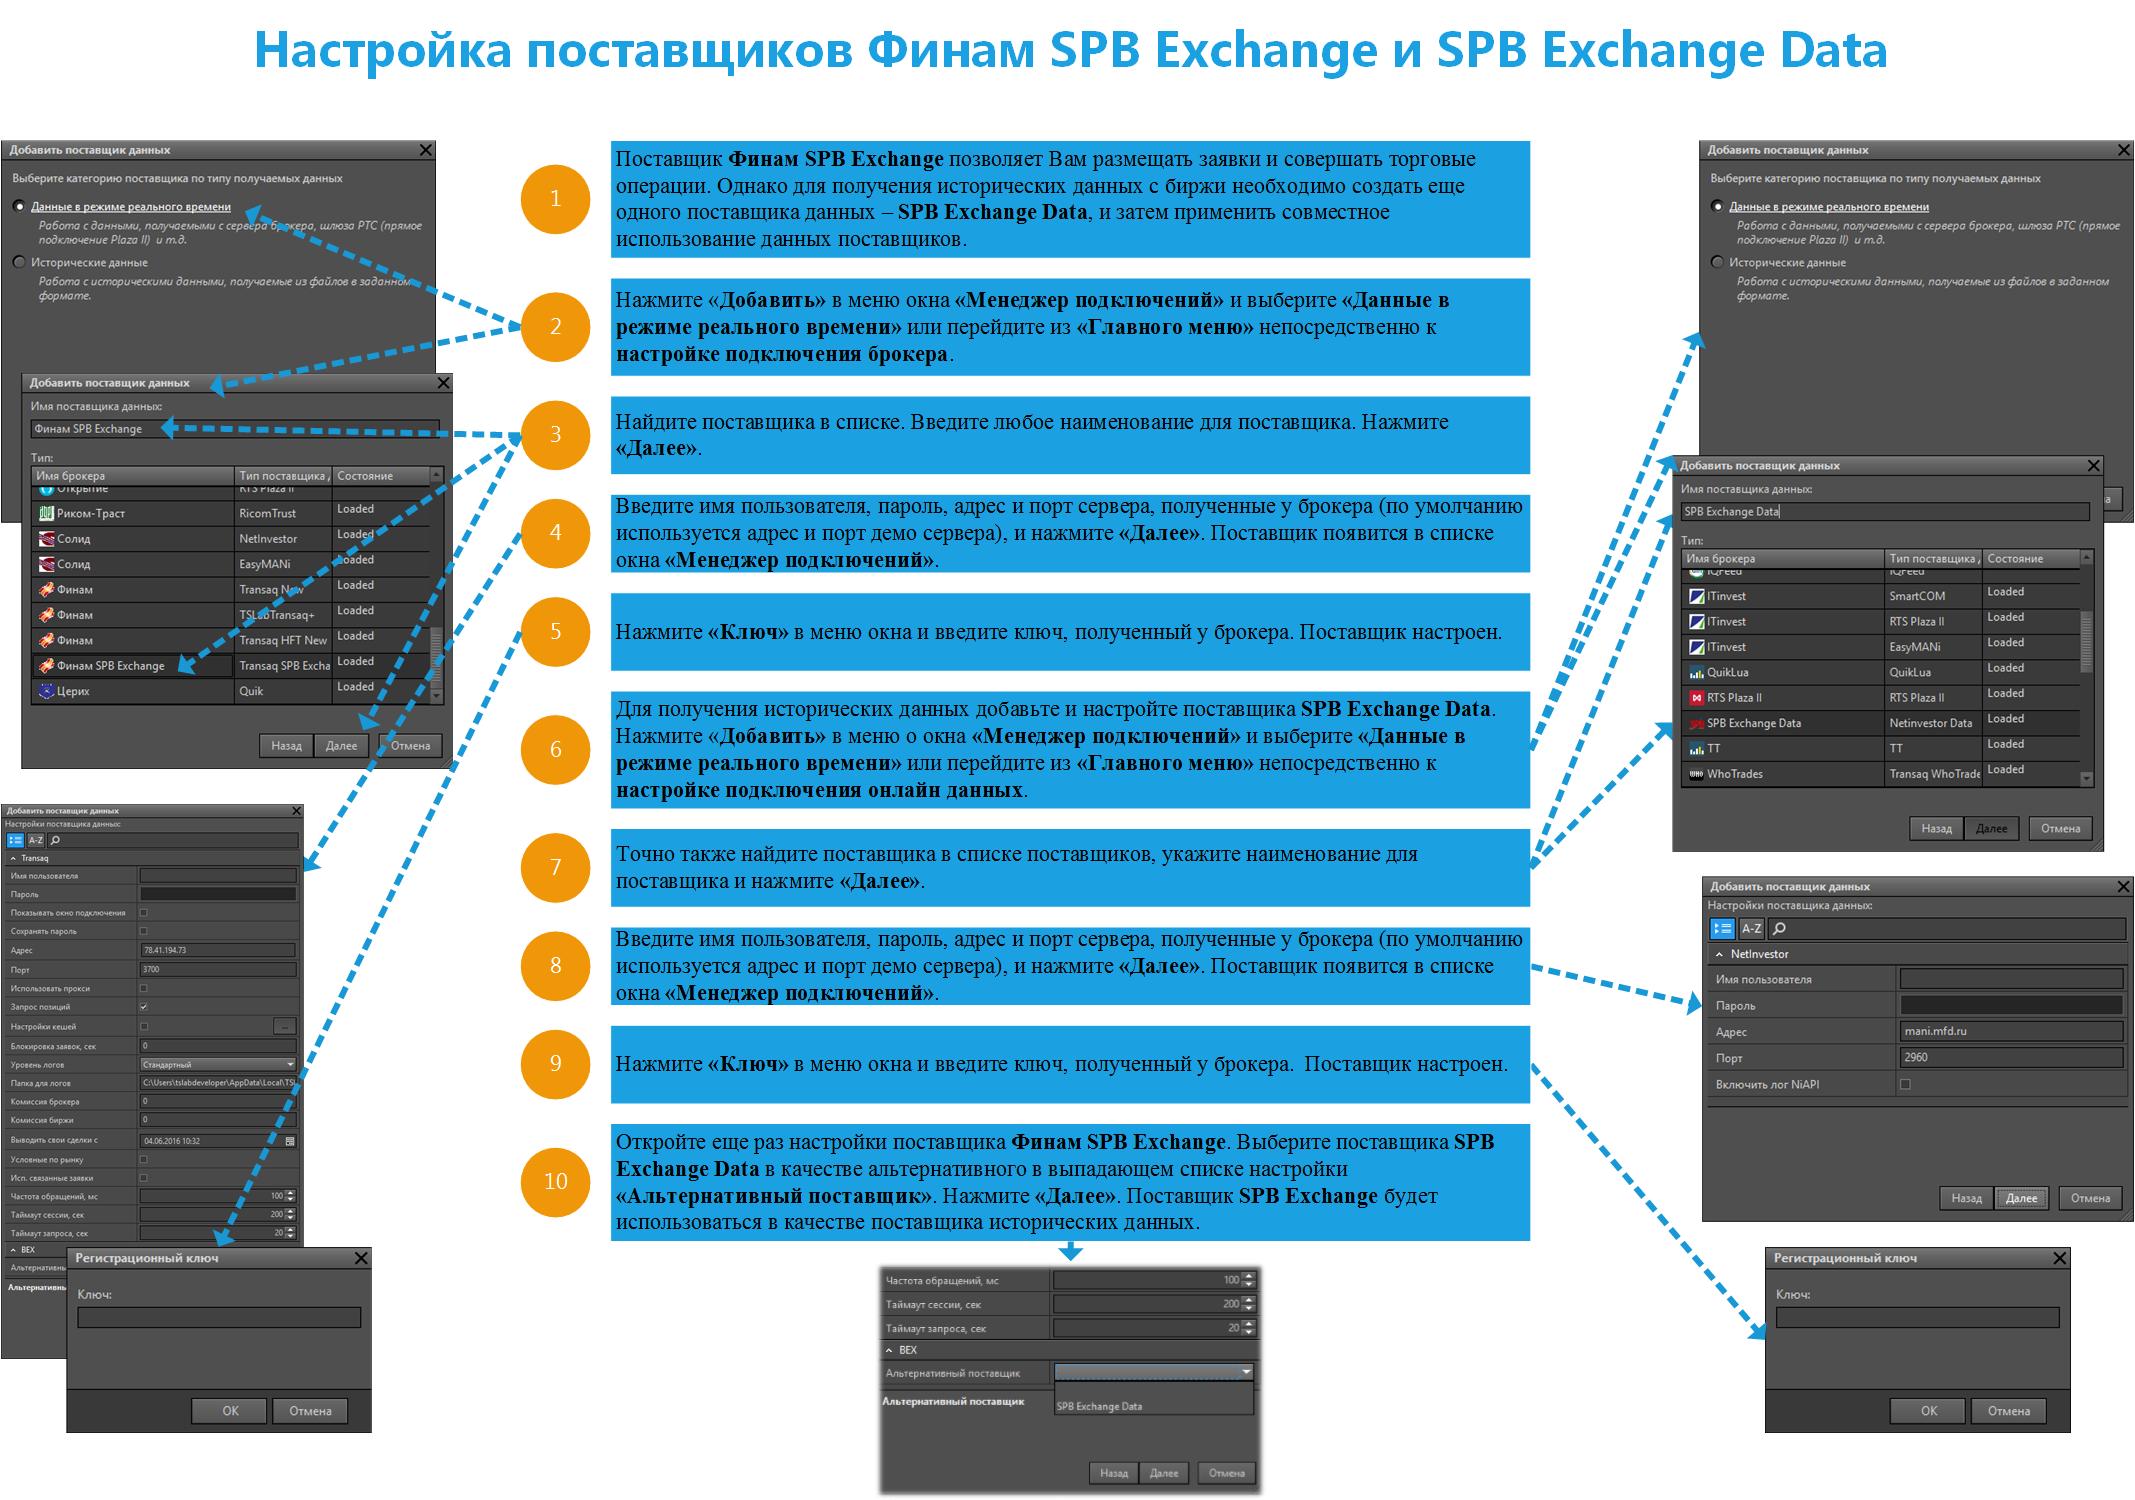 Настройка поставщиков Финам SPB Exchange